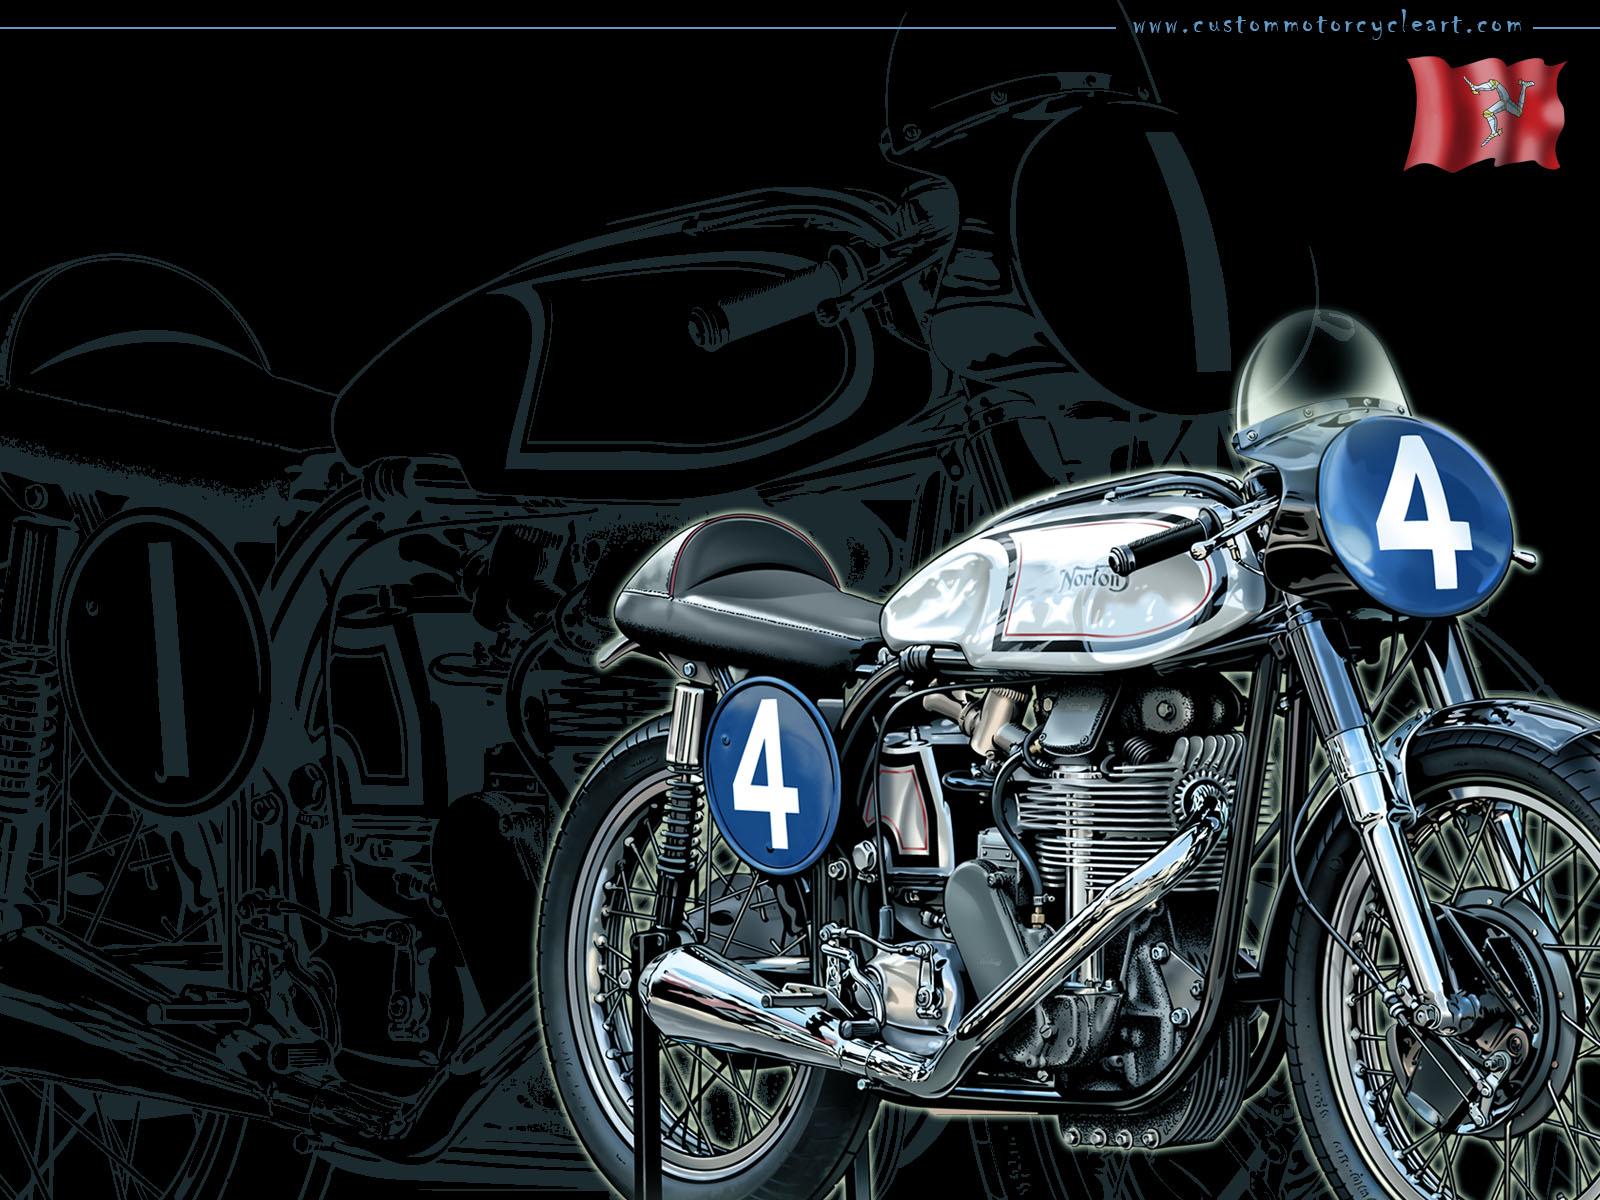 Vintage Motorcycle Wallpapers Free Download Wallpapersafari